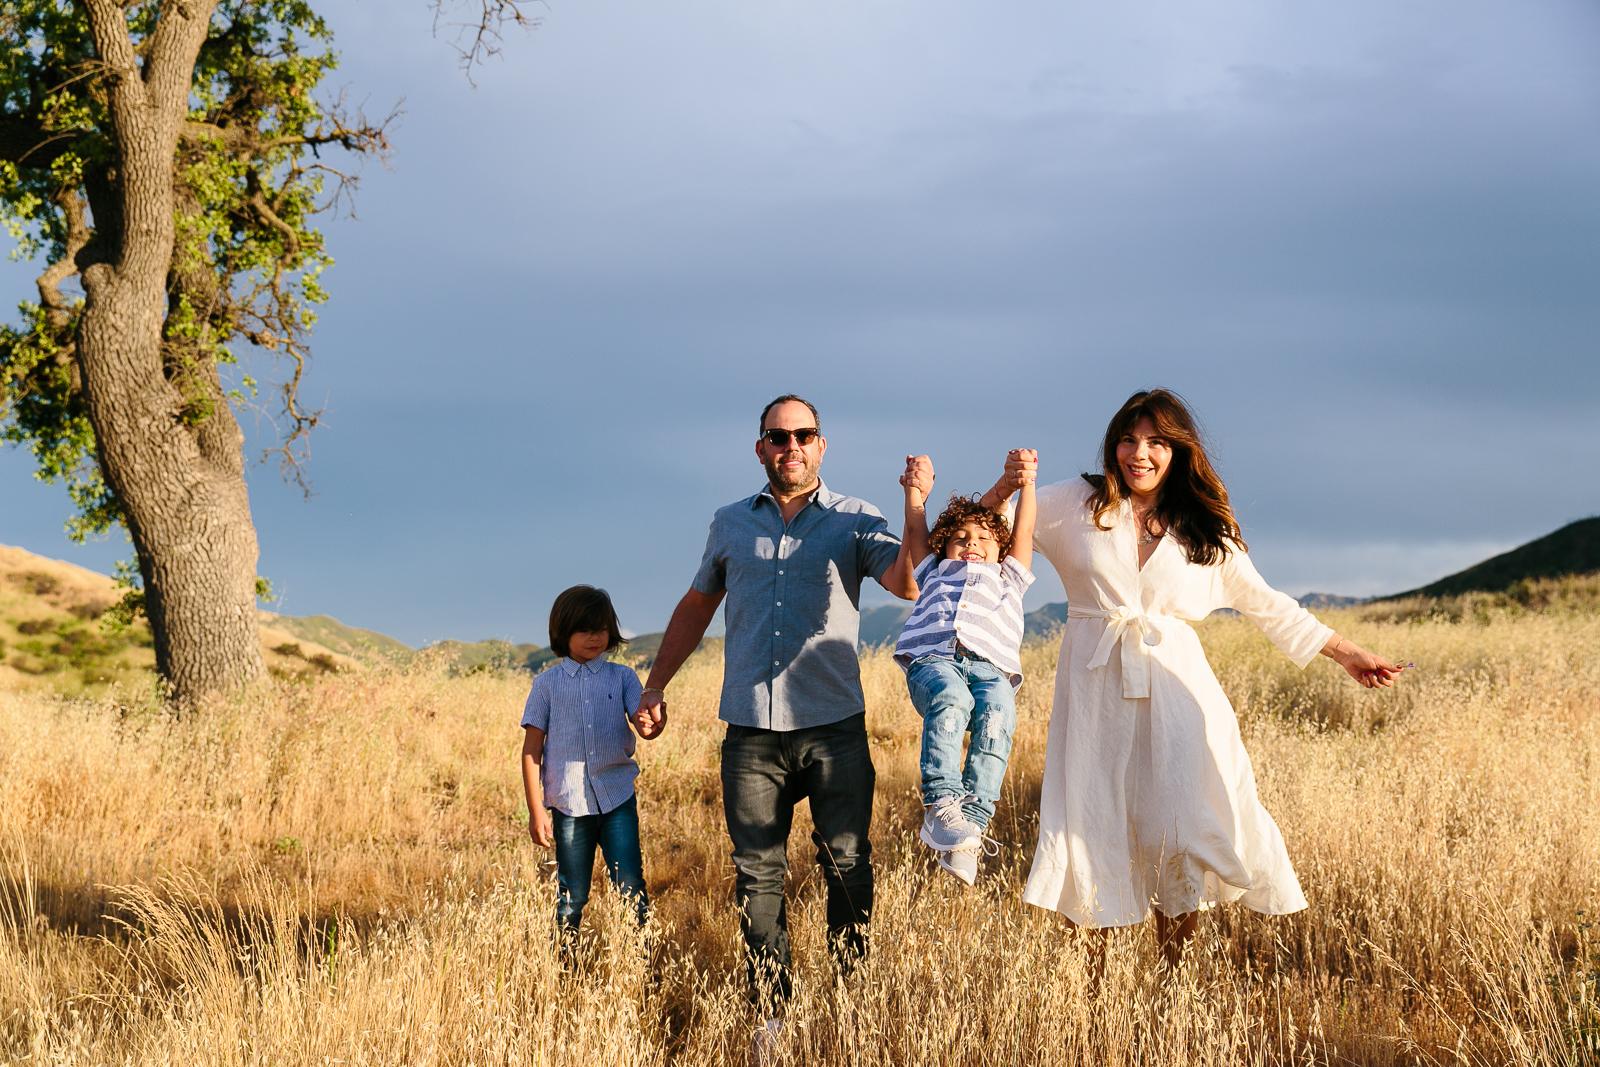 Los_Angeles_Family_Photographer-0822.jpg